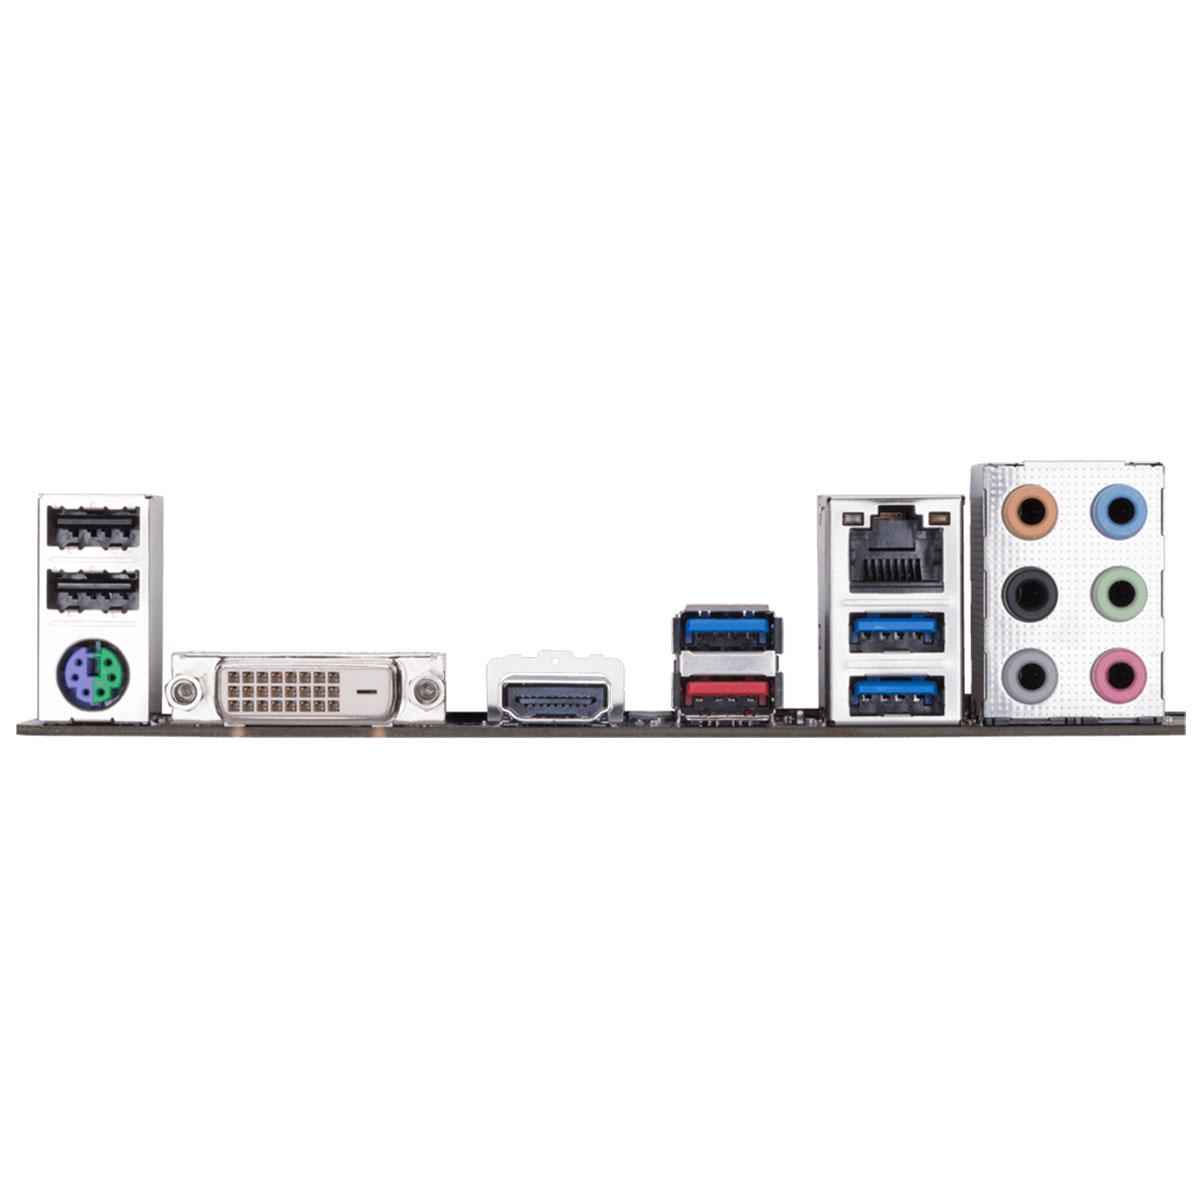 Kit Upgrade Gamer Xtreme, Gigabyte B360M Aorus Gaming 3, I7-9700F, RTX 2060, 16GB DDR4 2666MHz